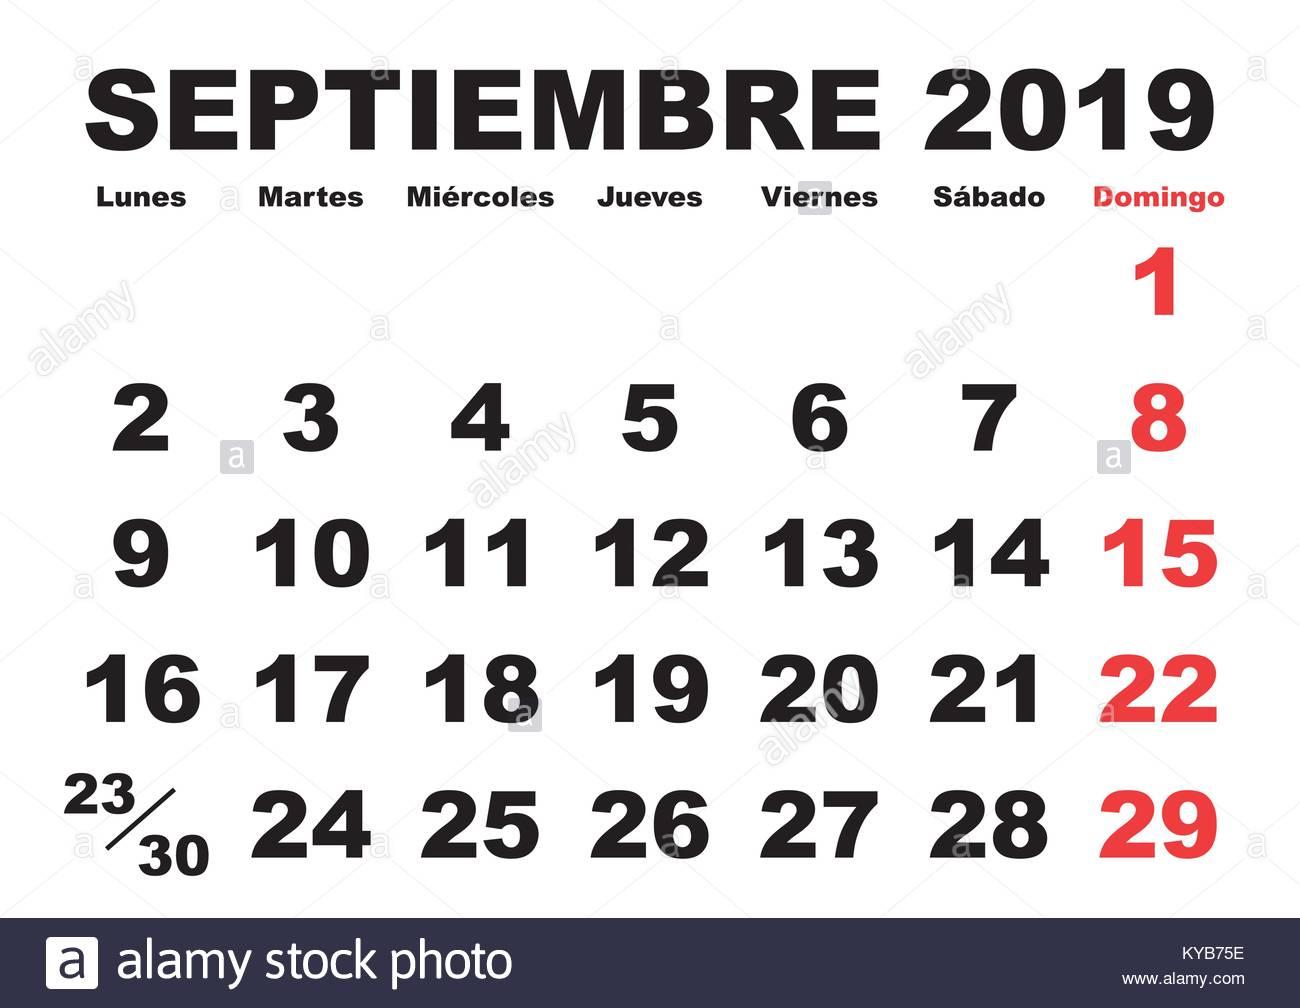 Calendario 18 19 Sep.September Month In A Year 2019 Wall Calendar In Spanish